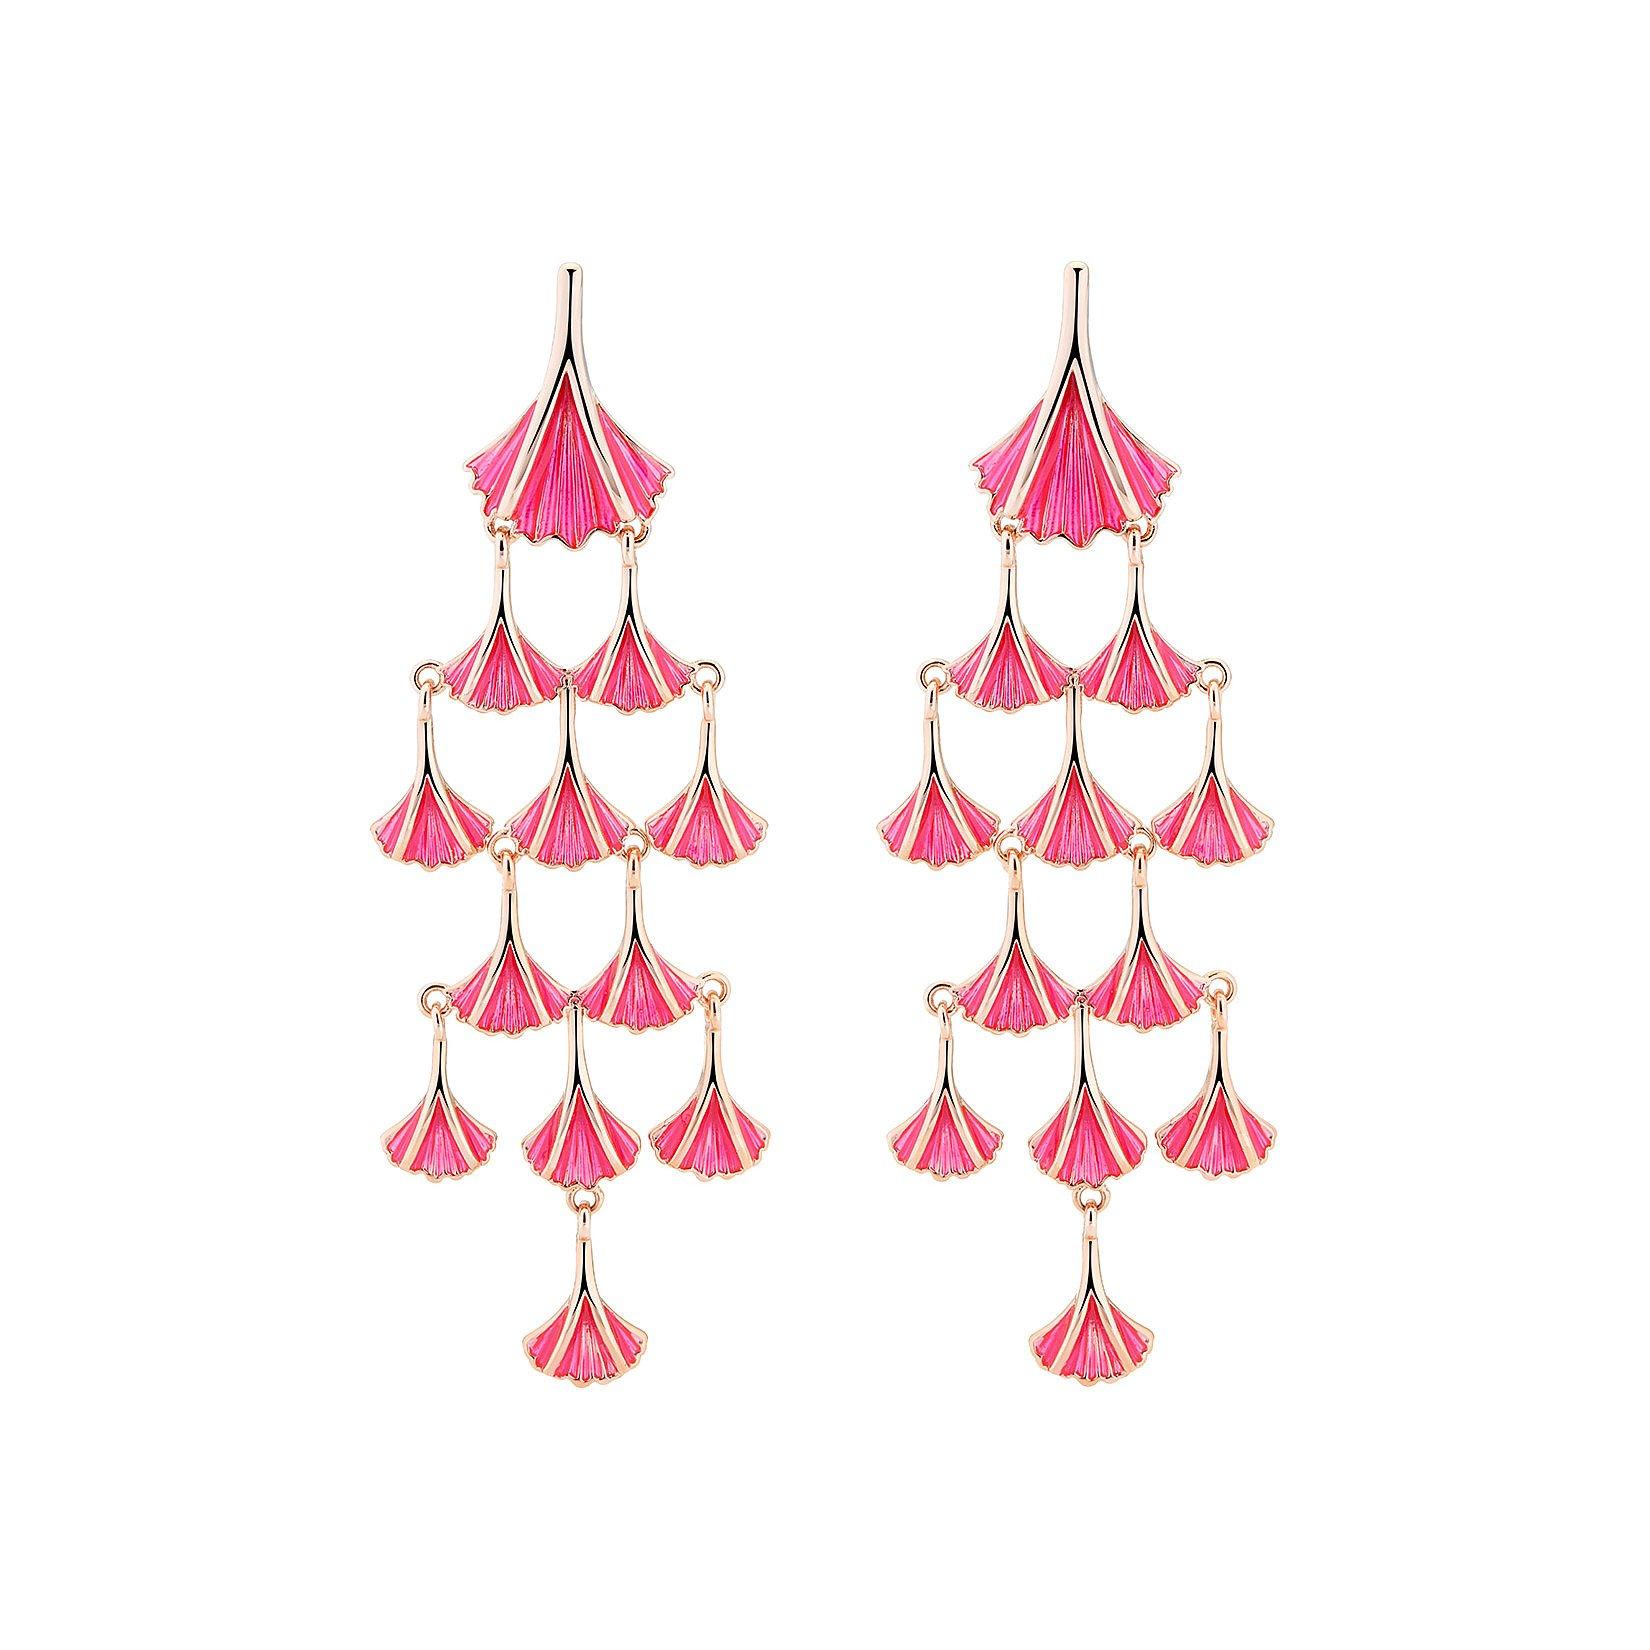 All We Are Aya Chandelier Earrings